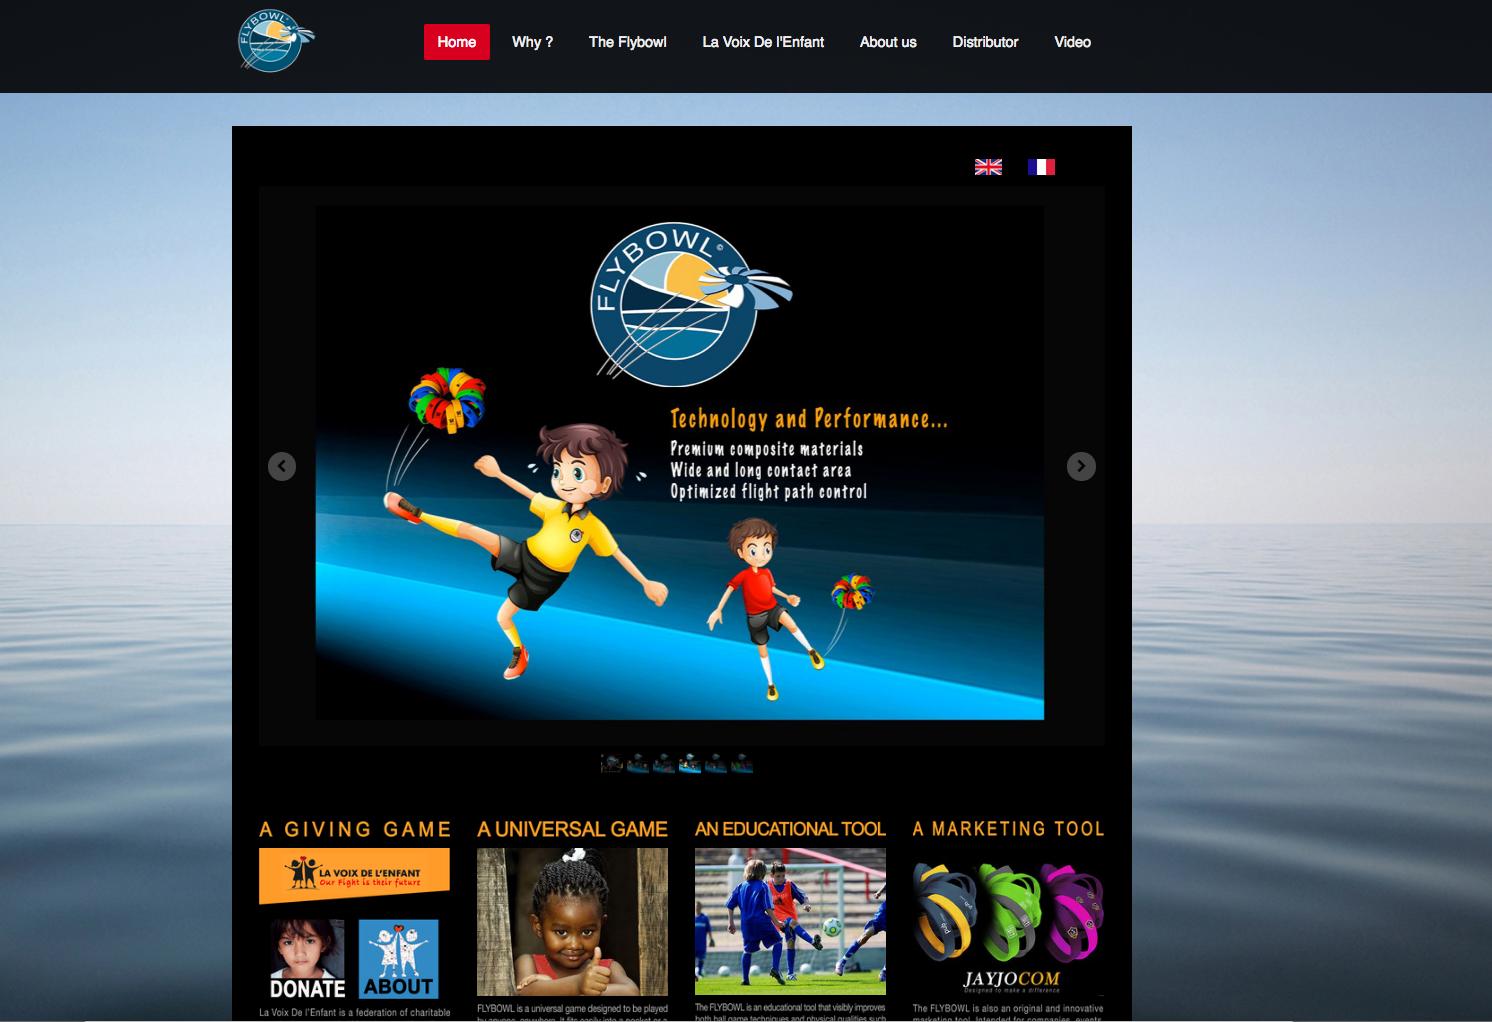 www.flybowl.com